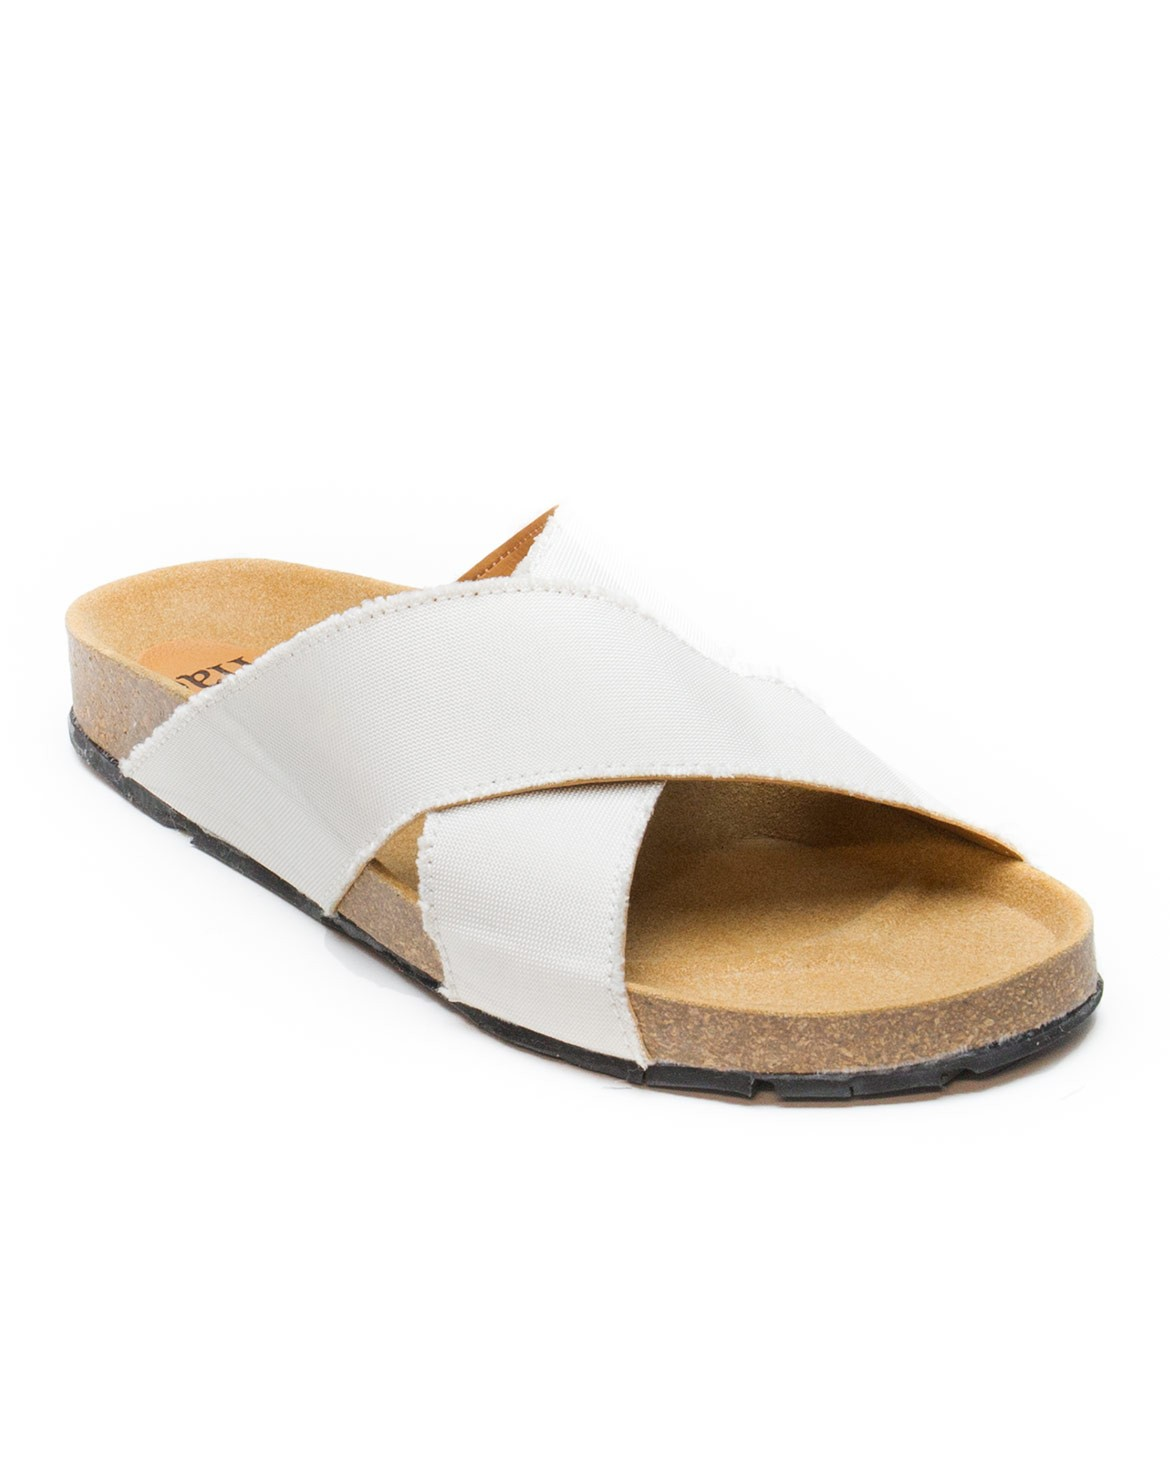 Re-Car Sandal